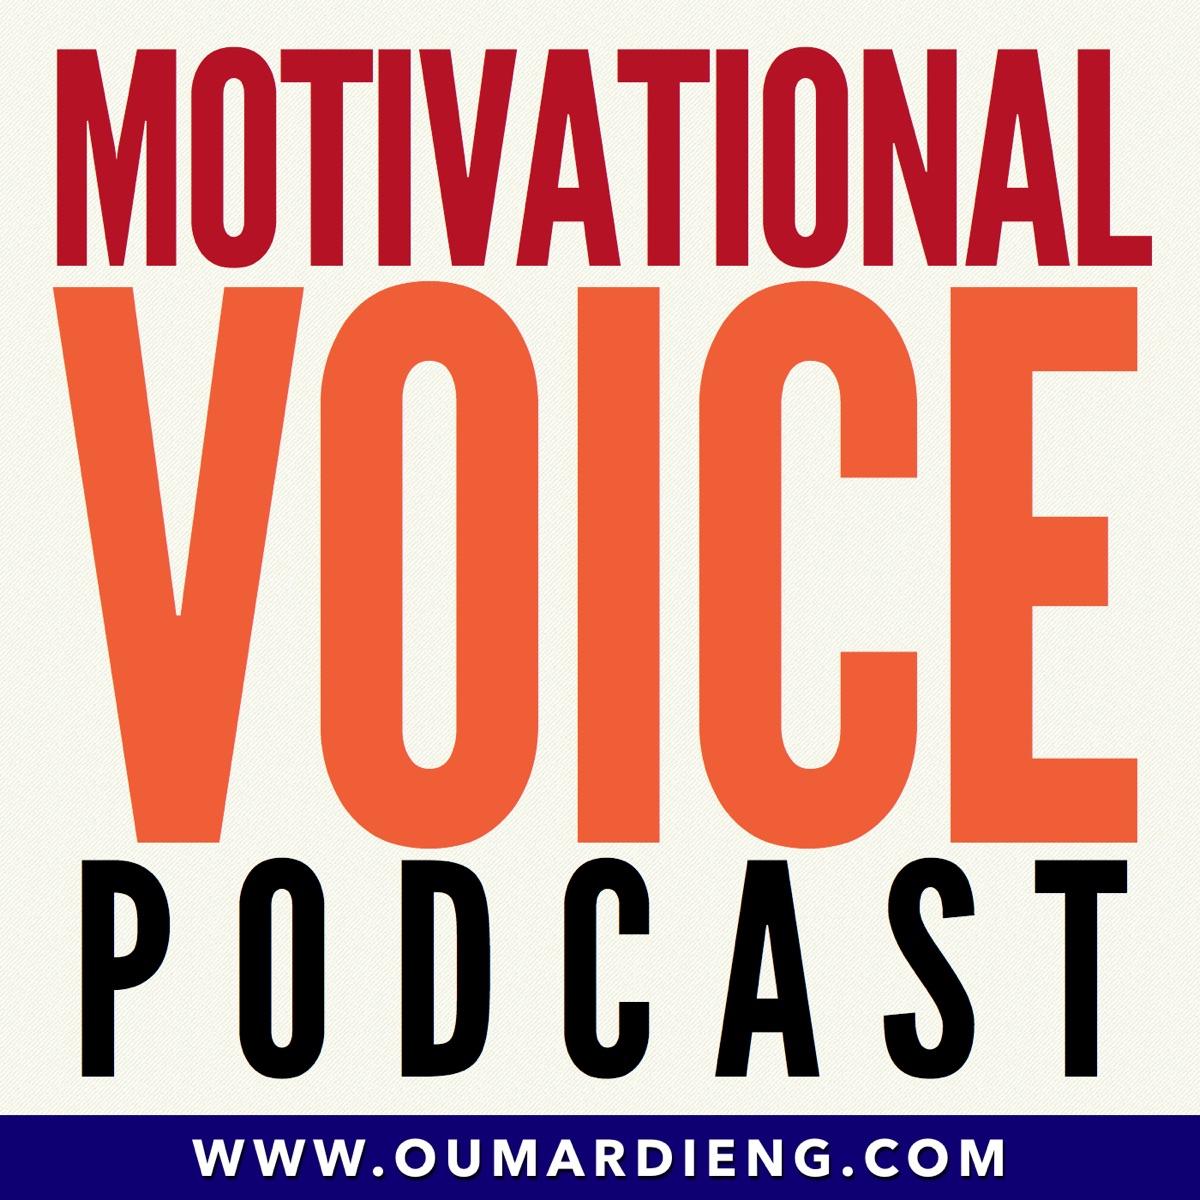 The Motivational Voice Podcast | Motivation, Positivity and Life Skills